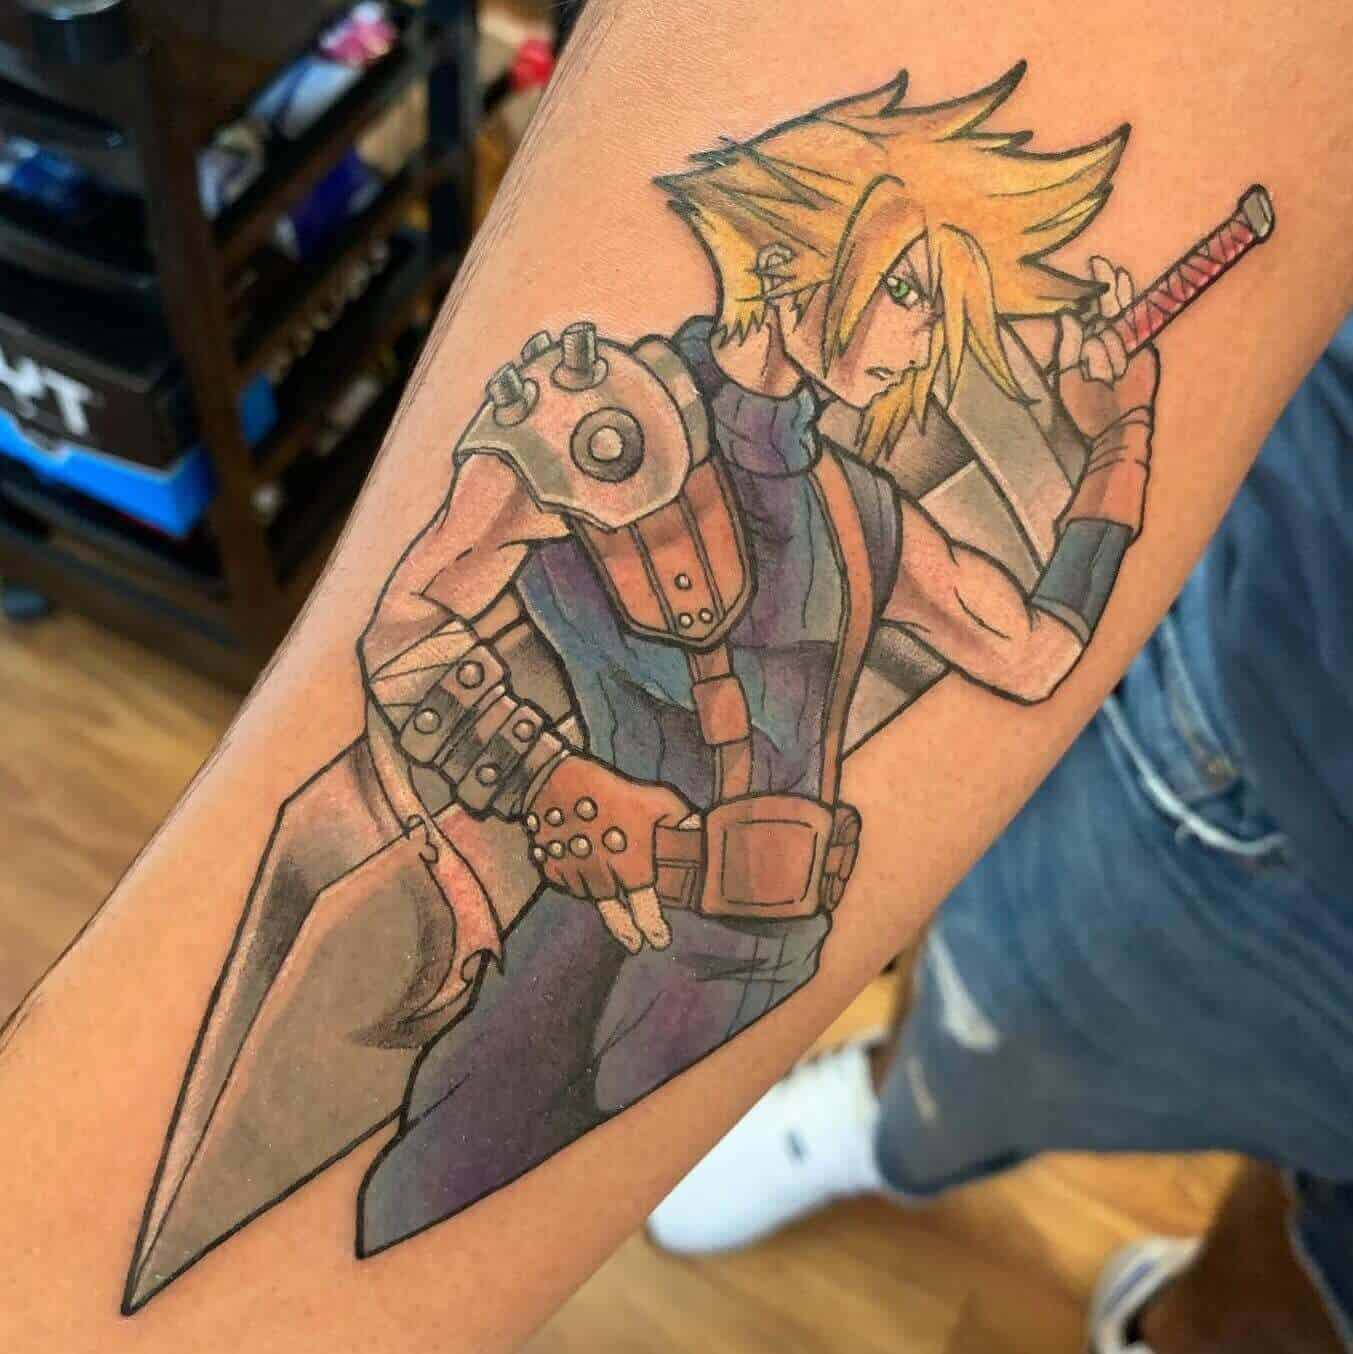 ff7 tattoo on arm